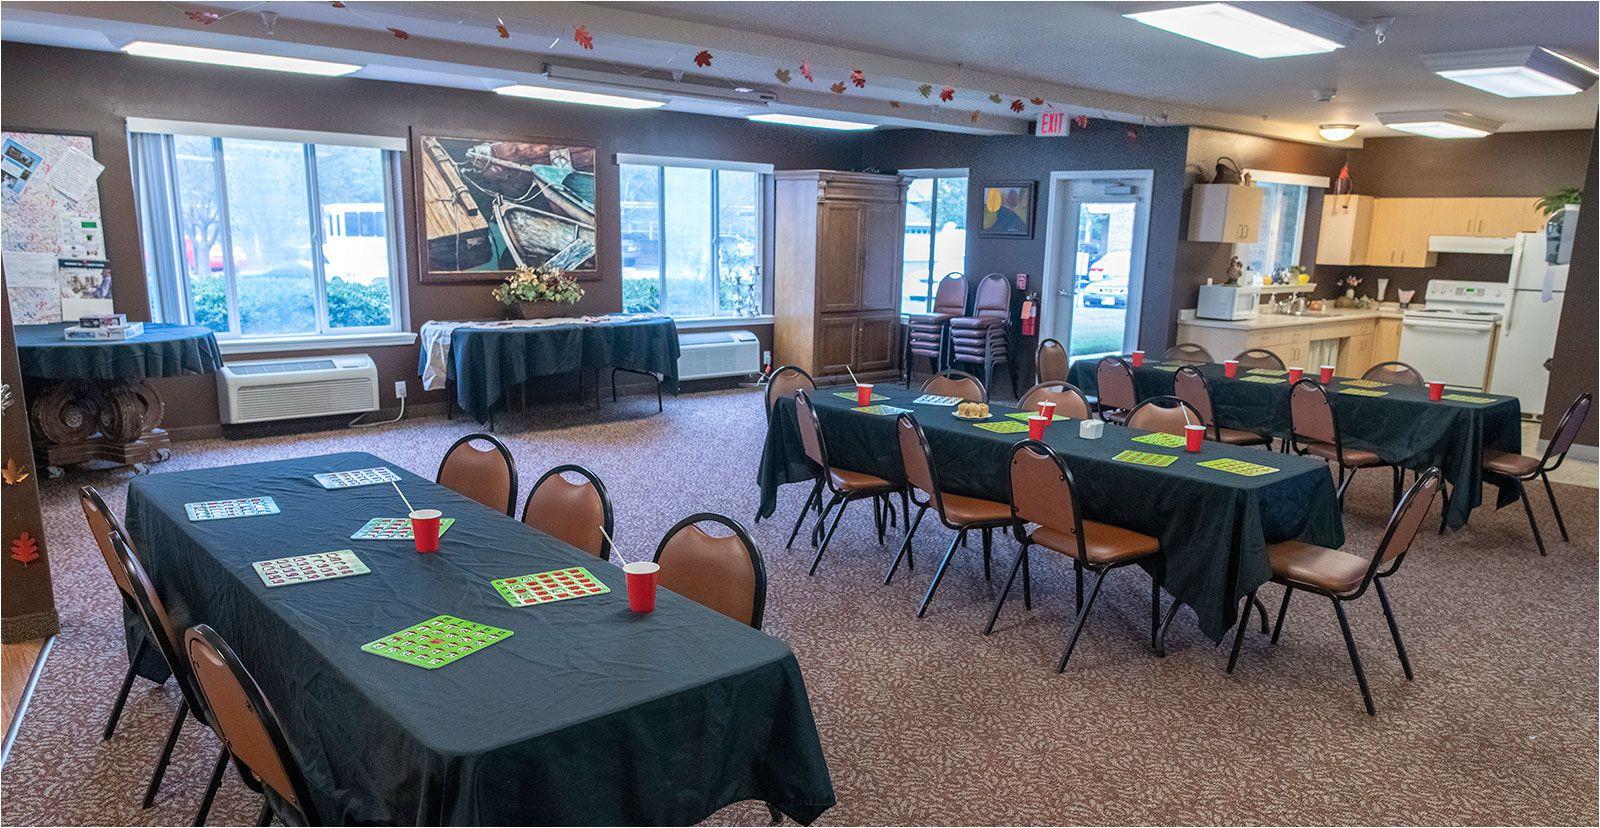 resident activity room at jordan oaks independent senior living community